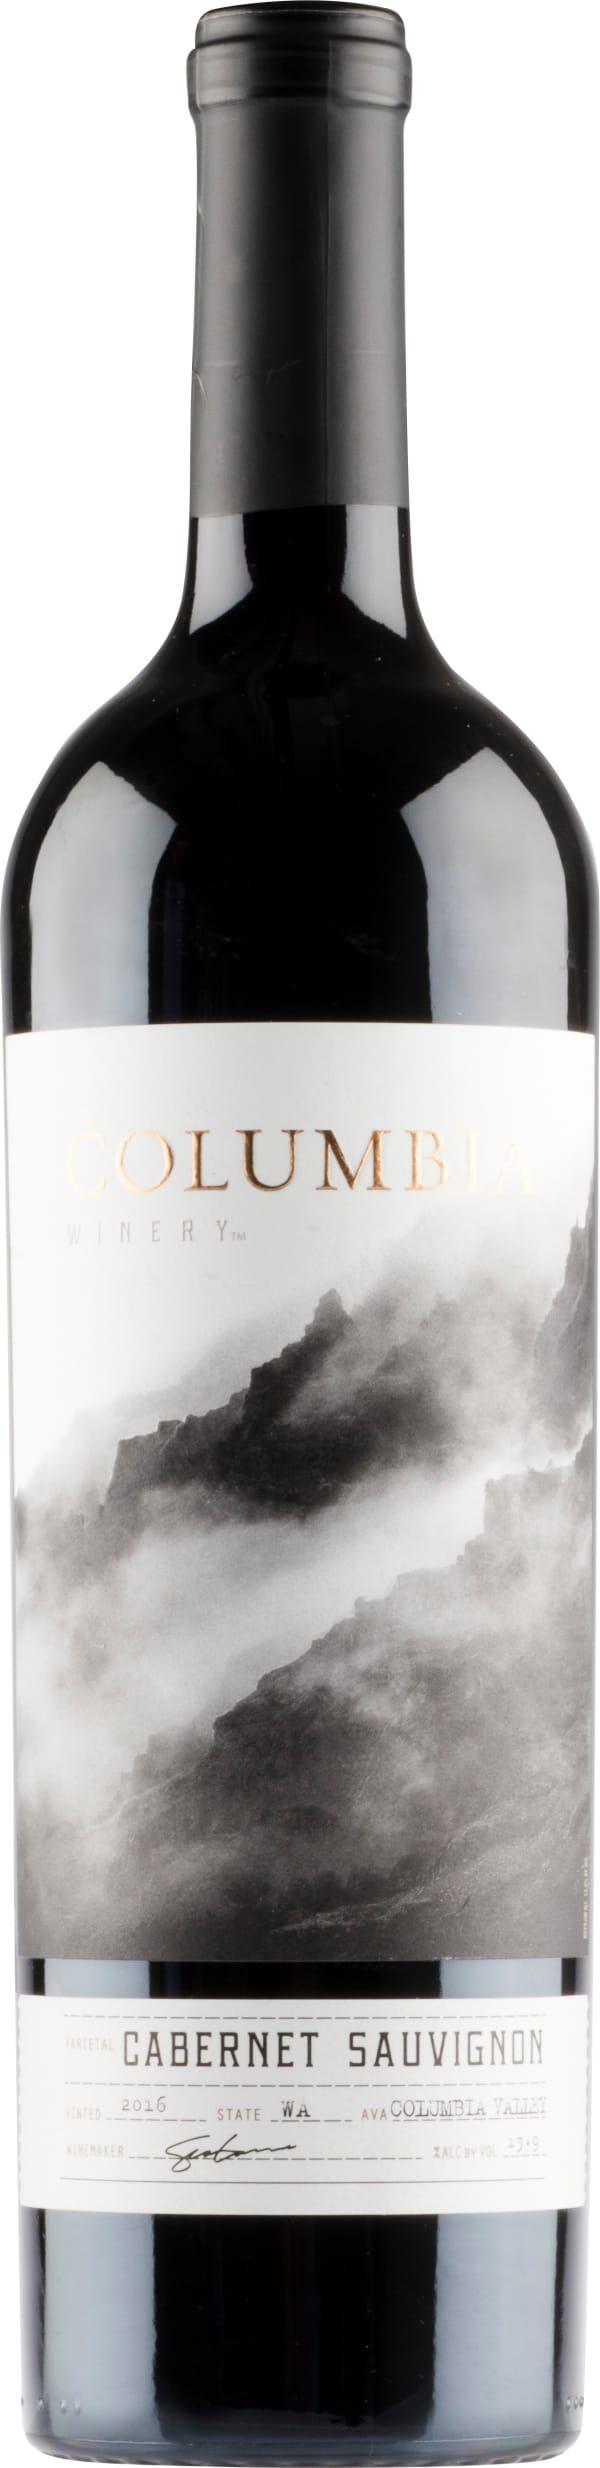 Columbia Winery Cabernet Sauvignon 2016